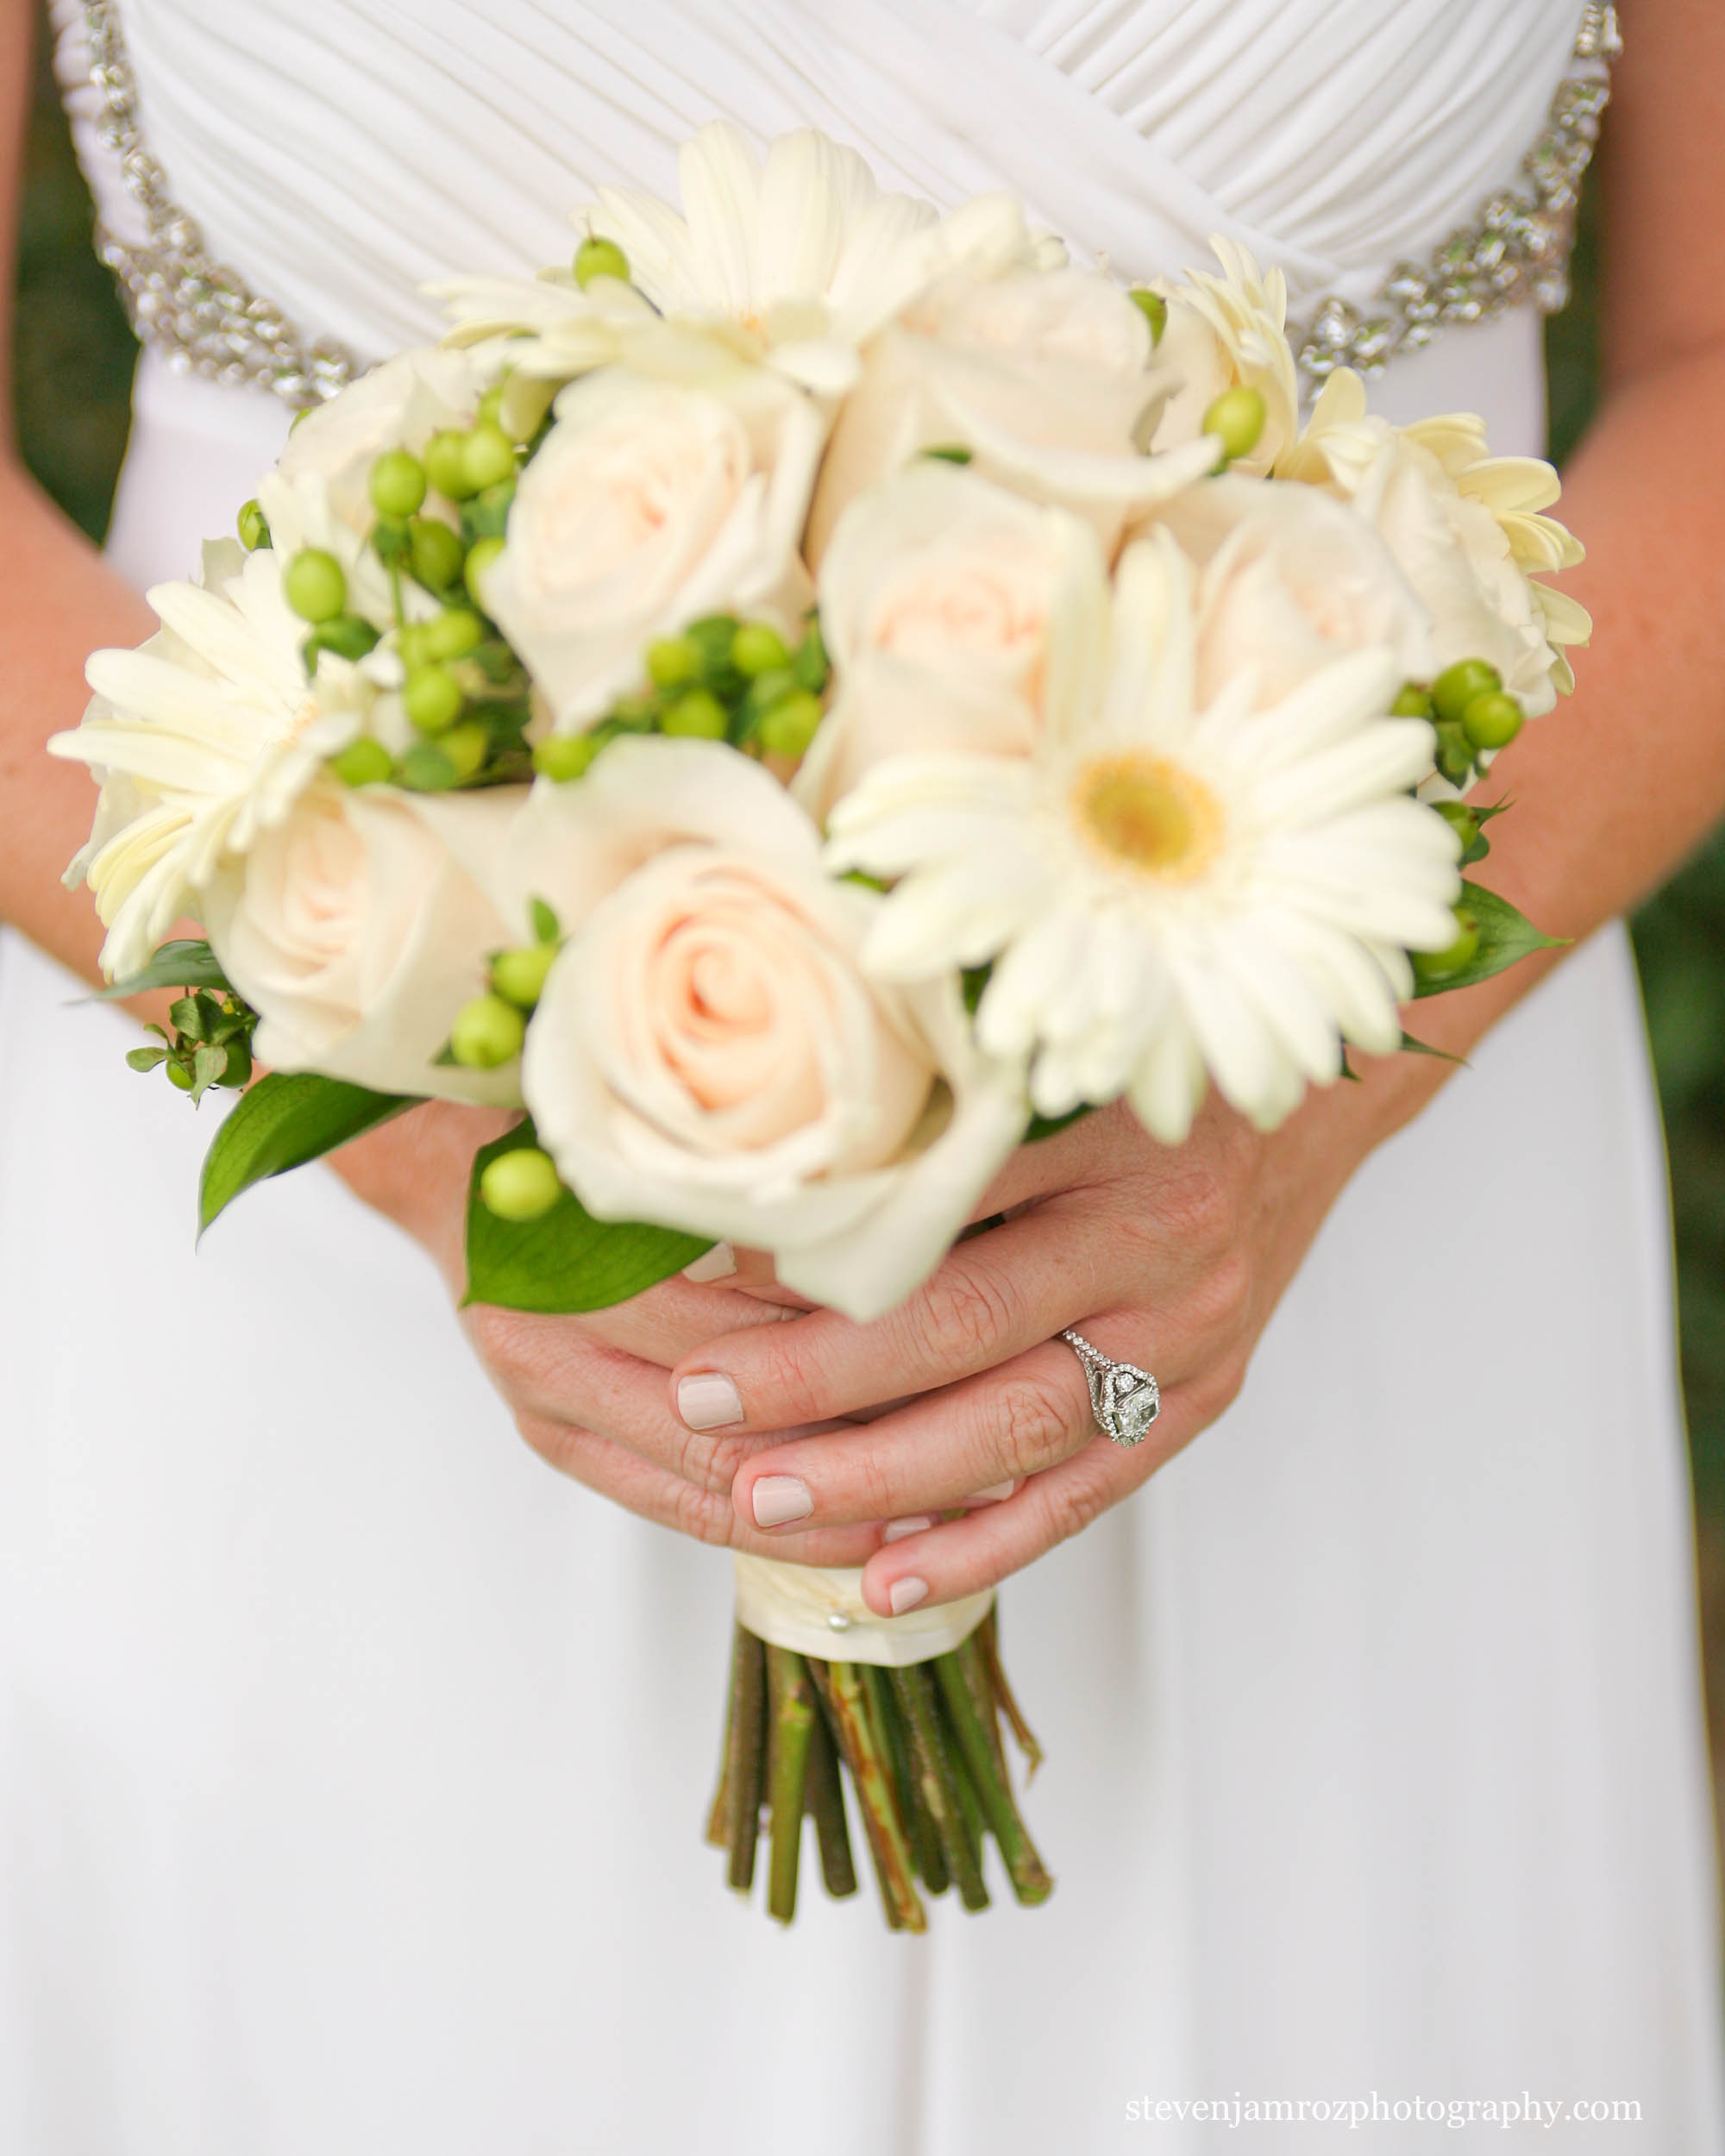 bride-holding-bouquet-wedding-steven-jamroz-photography-0559.jpg